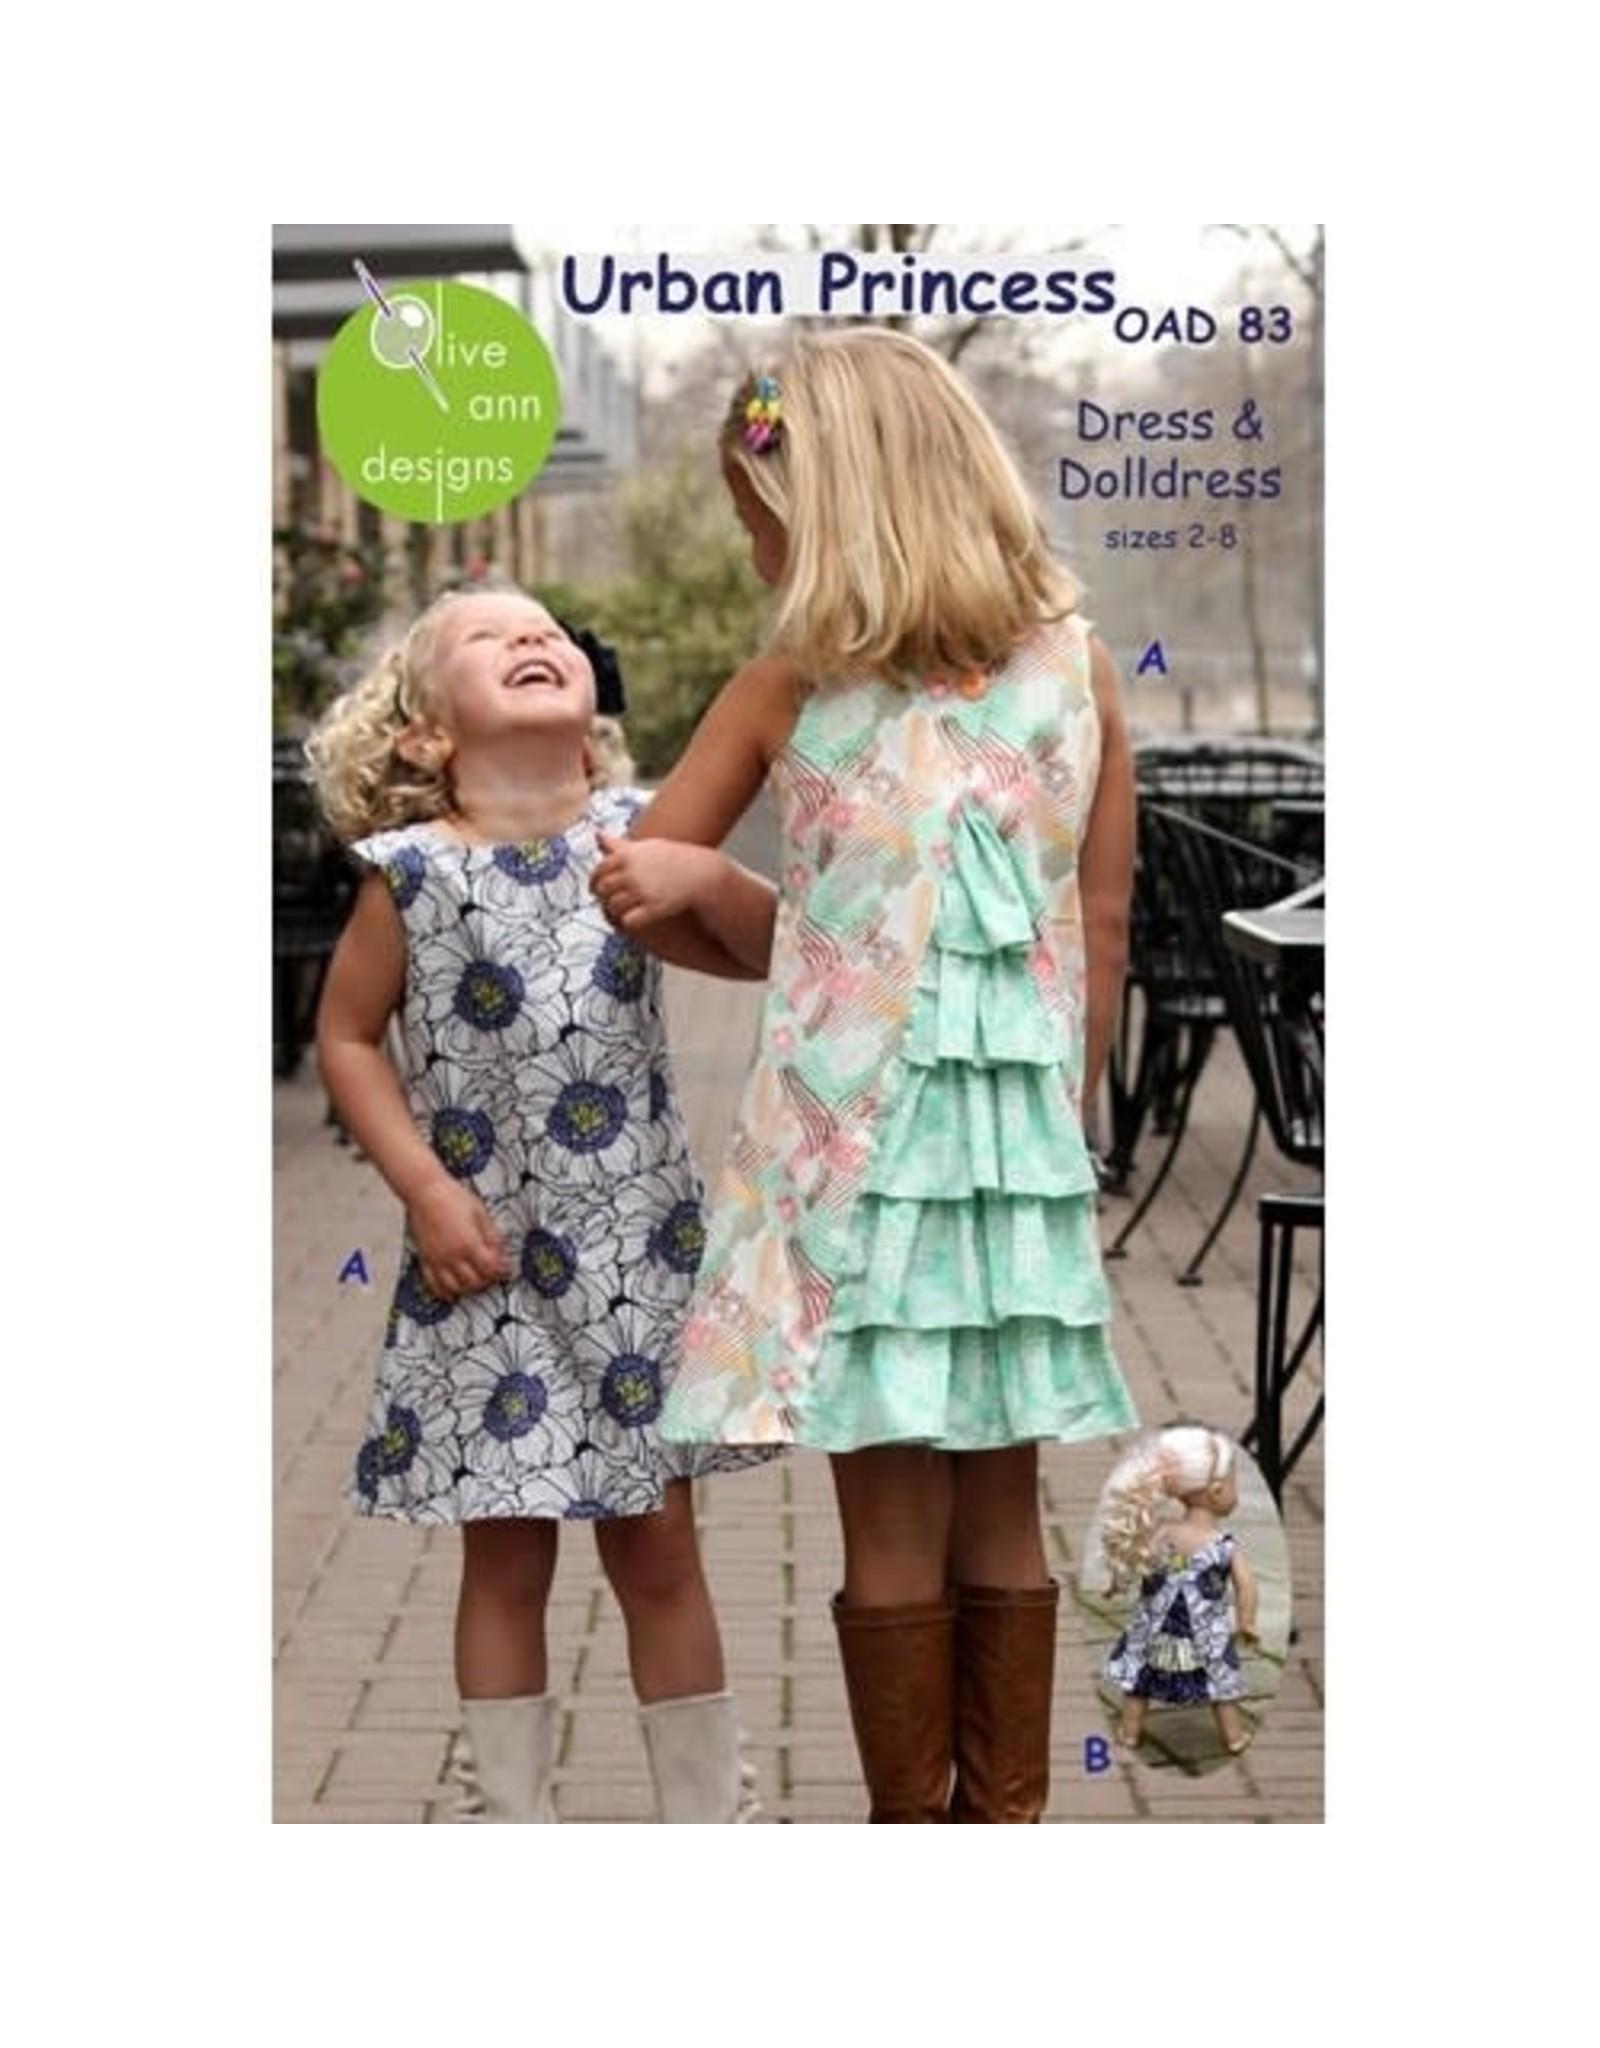 Picking Daisies Urban Princess Dress Pattern for Girls and Dolls